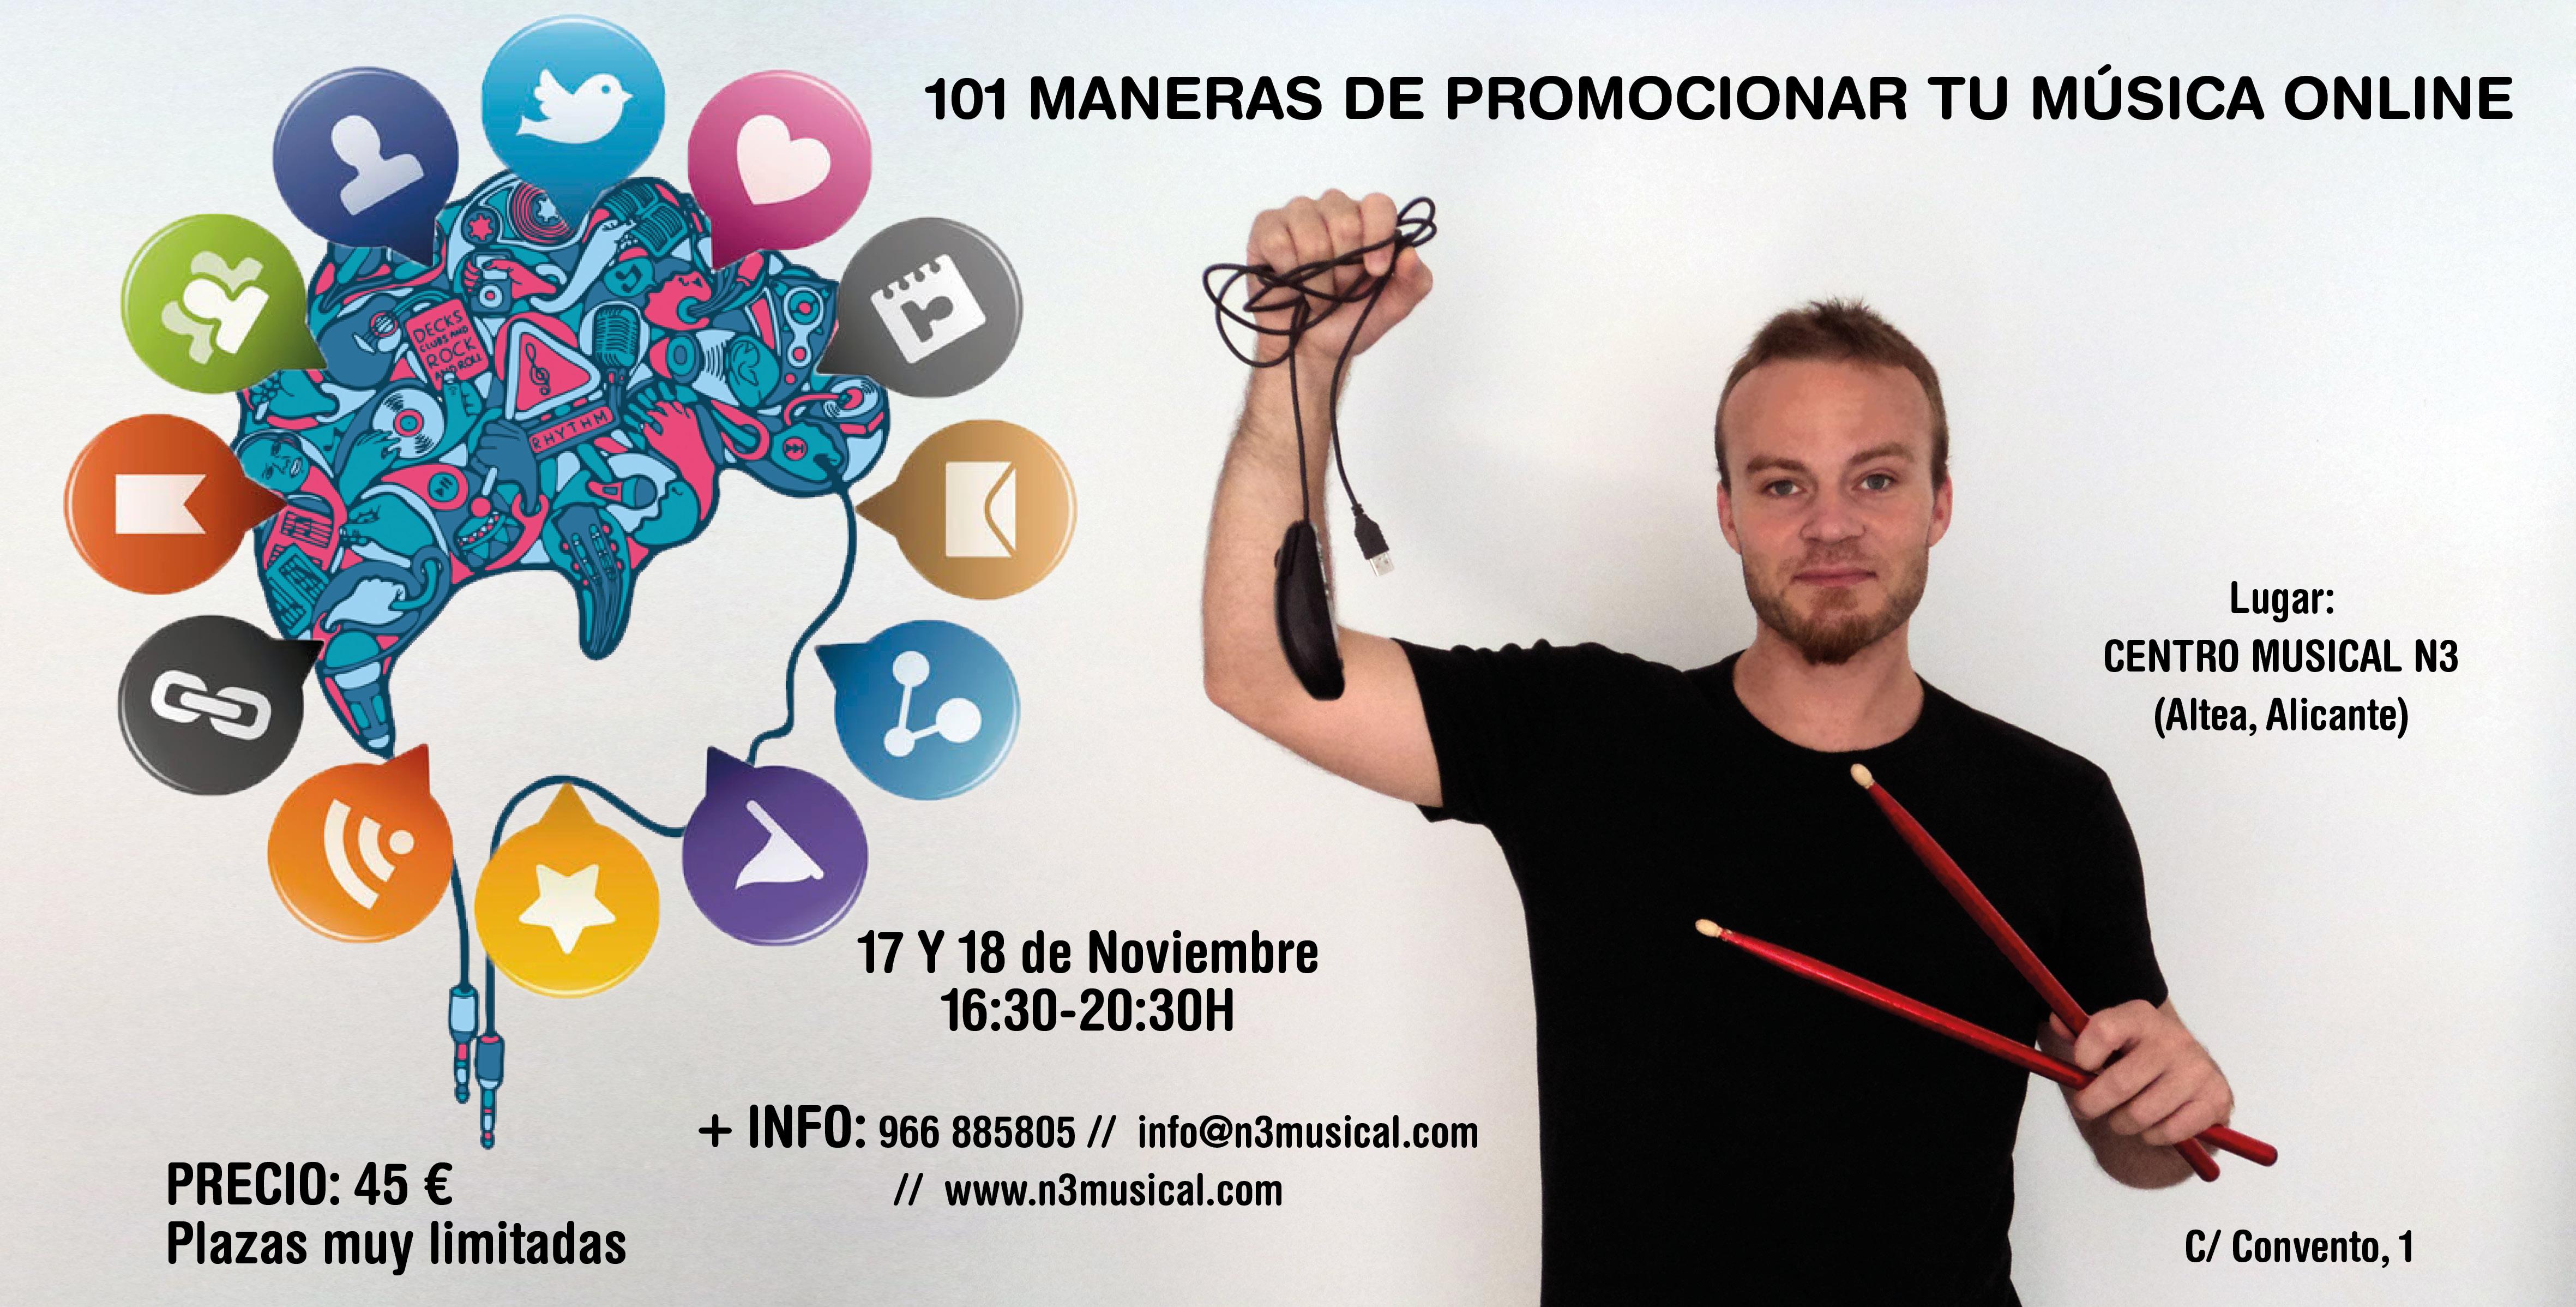 101 Maneras de promocionar tu música